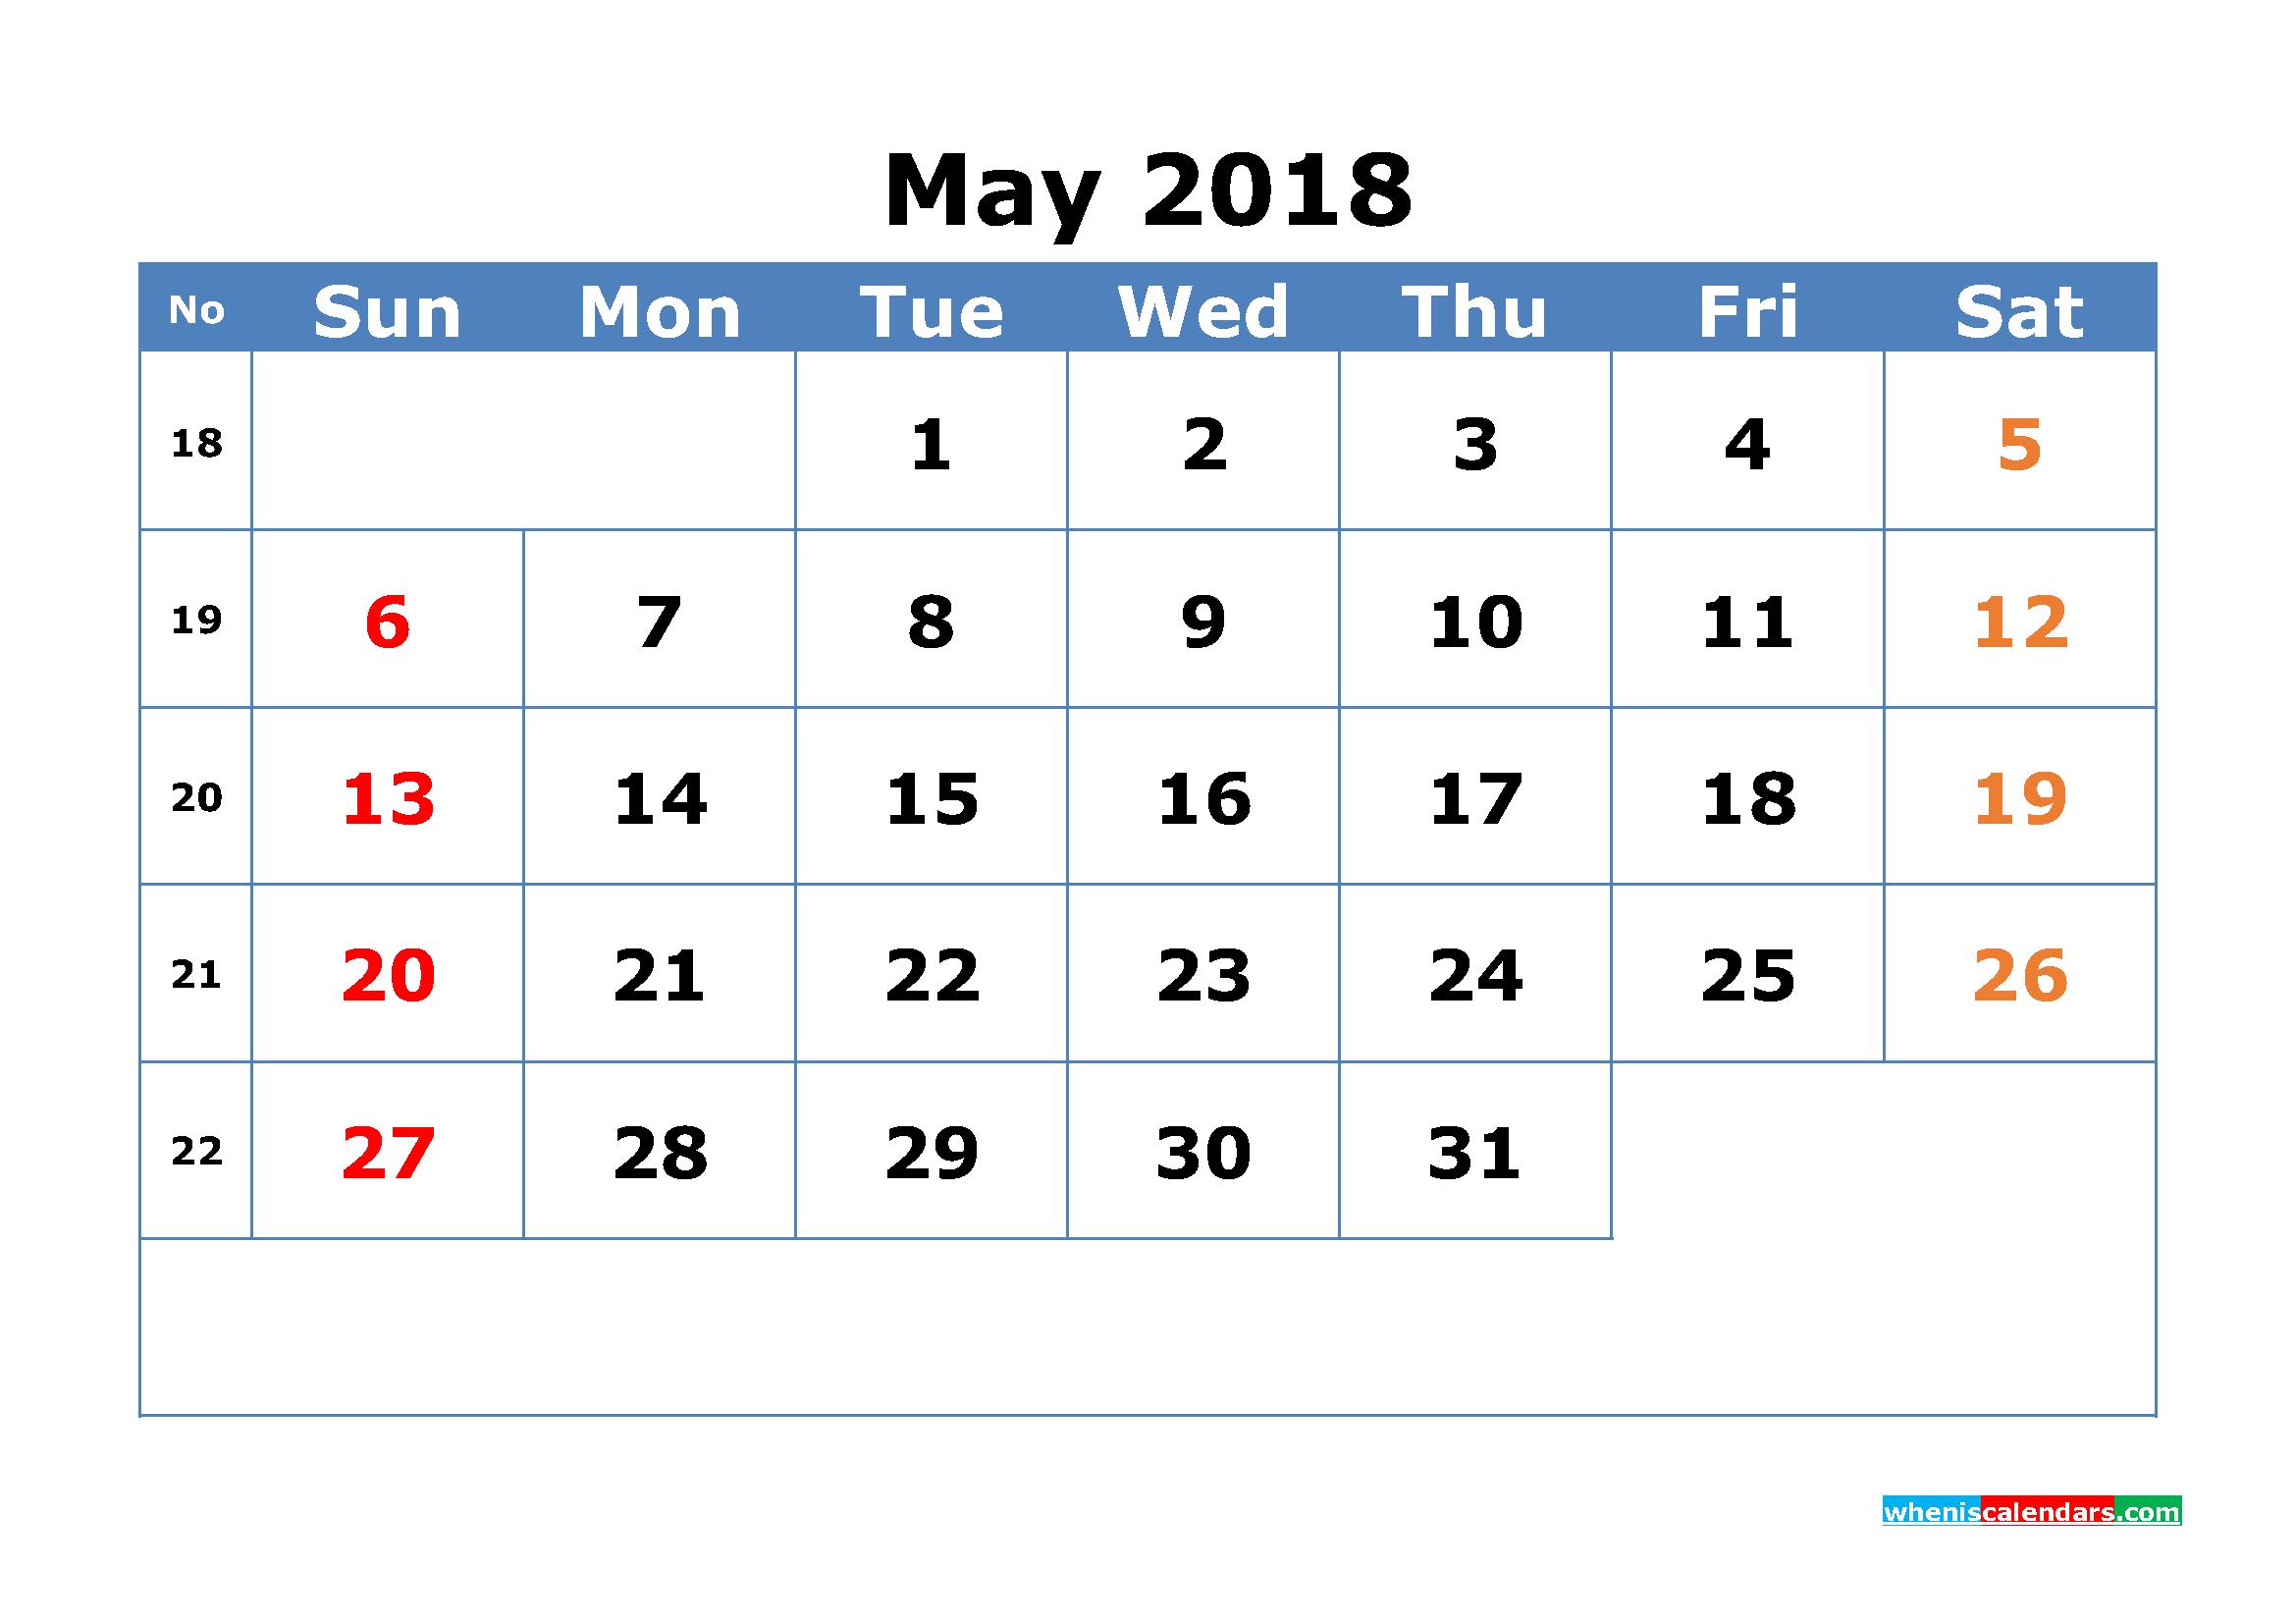 May Calendar Pieces : Printable calendar may with week numbers pdf image